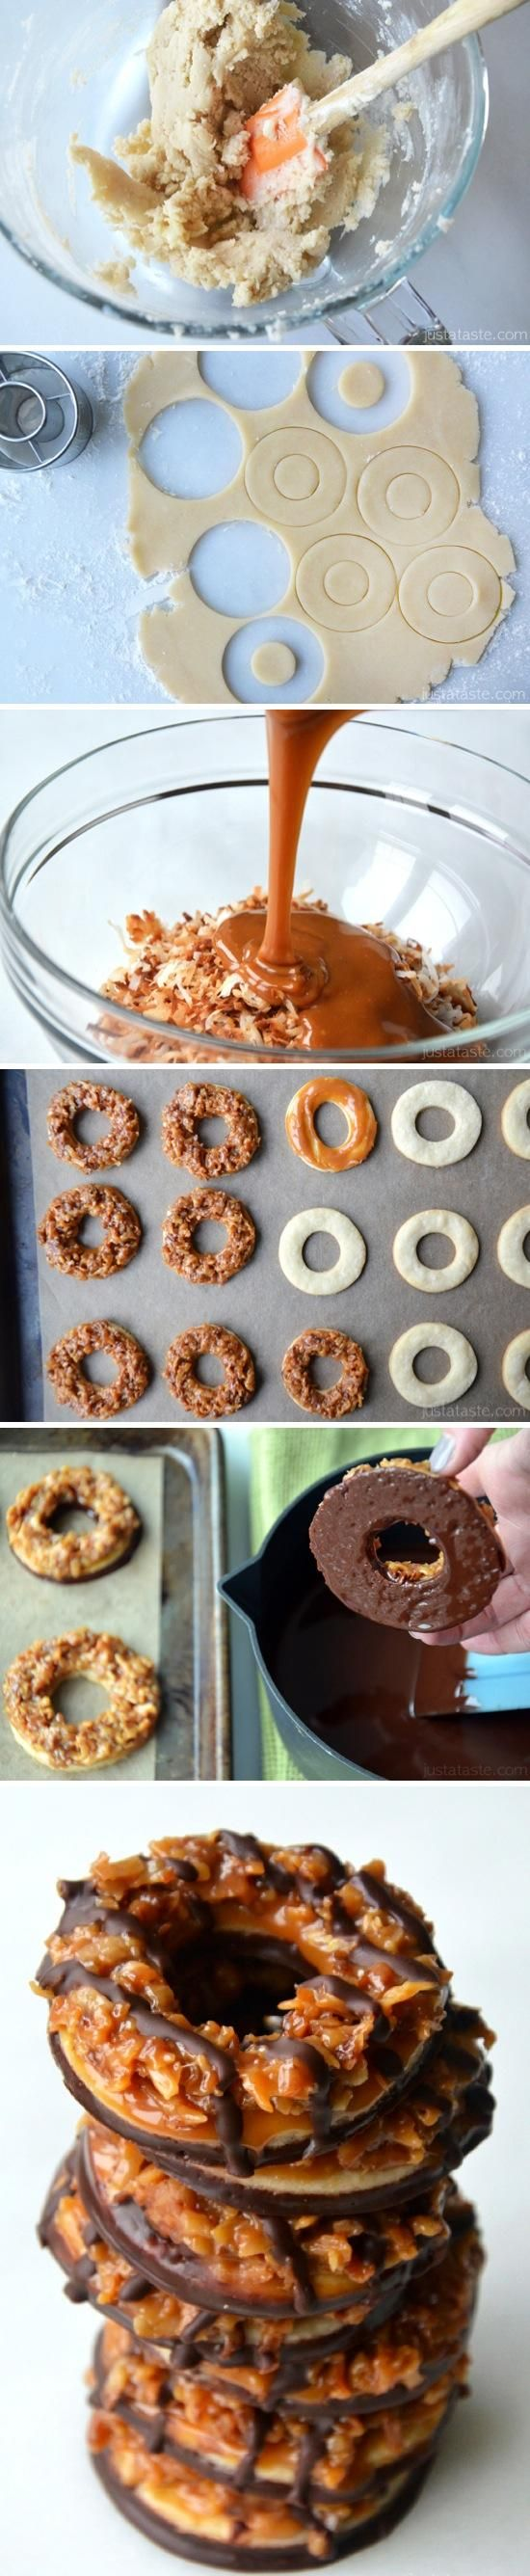 Homemade Samoas Girl Scout Cookies - Joybx